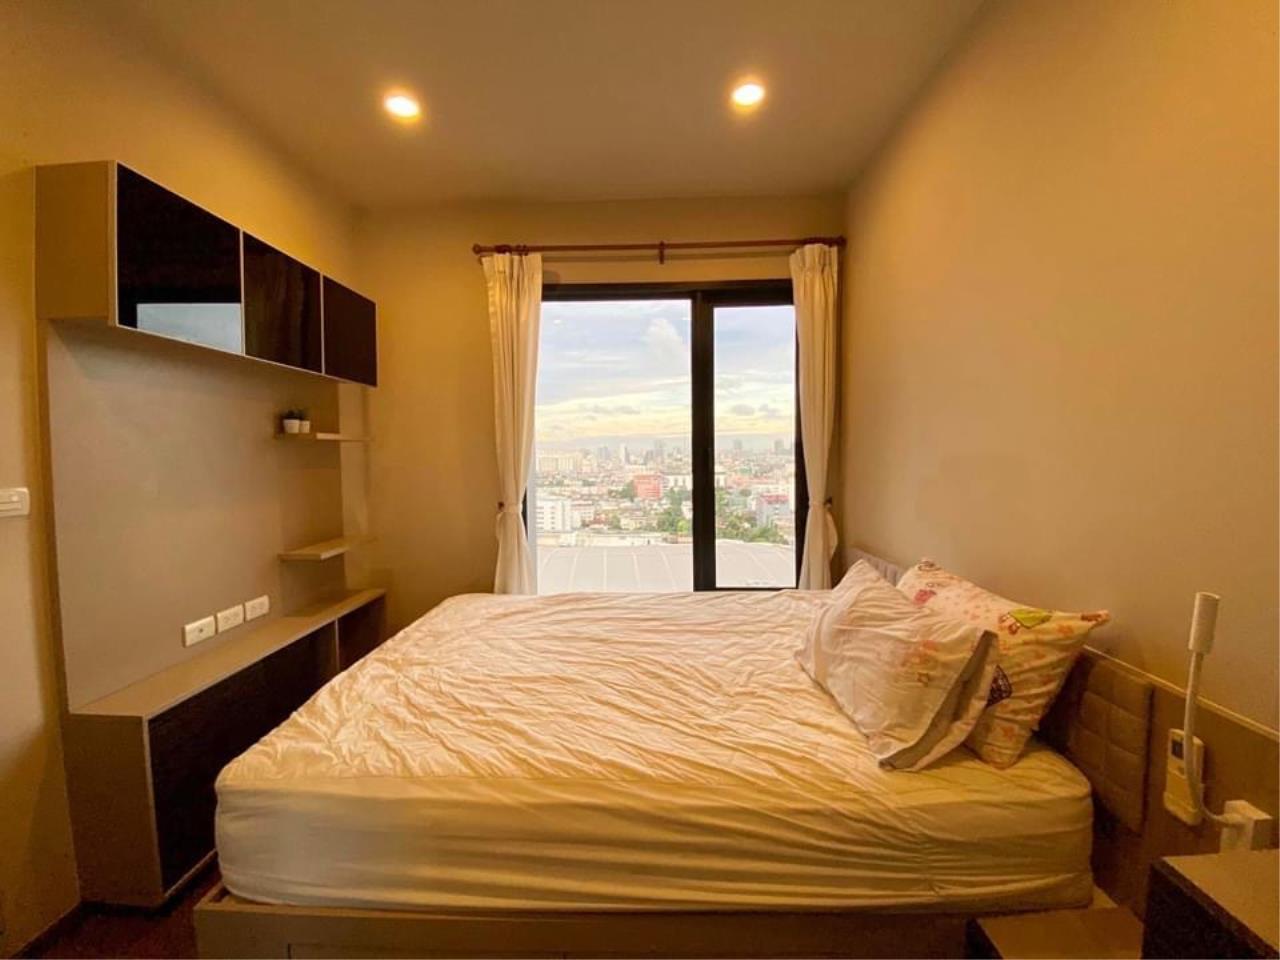 Agent - Phapayawarin Agency's Onyx Phaholyothin for Rent, 1 Bedroom 1 Bathroom, 31 Sq.m., BTS Saphan Khwai 3